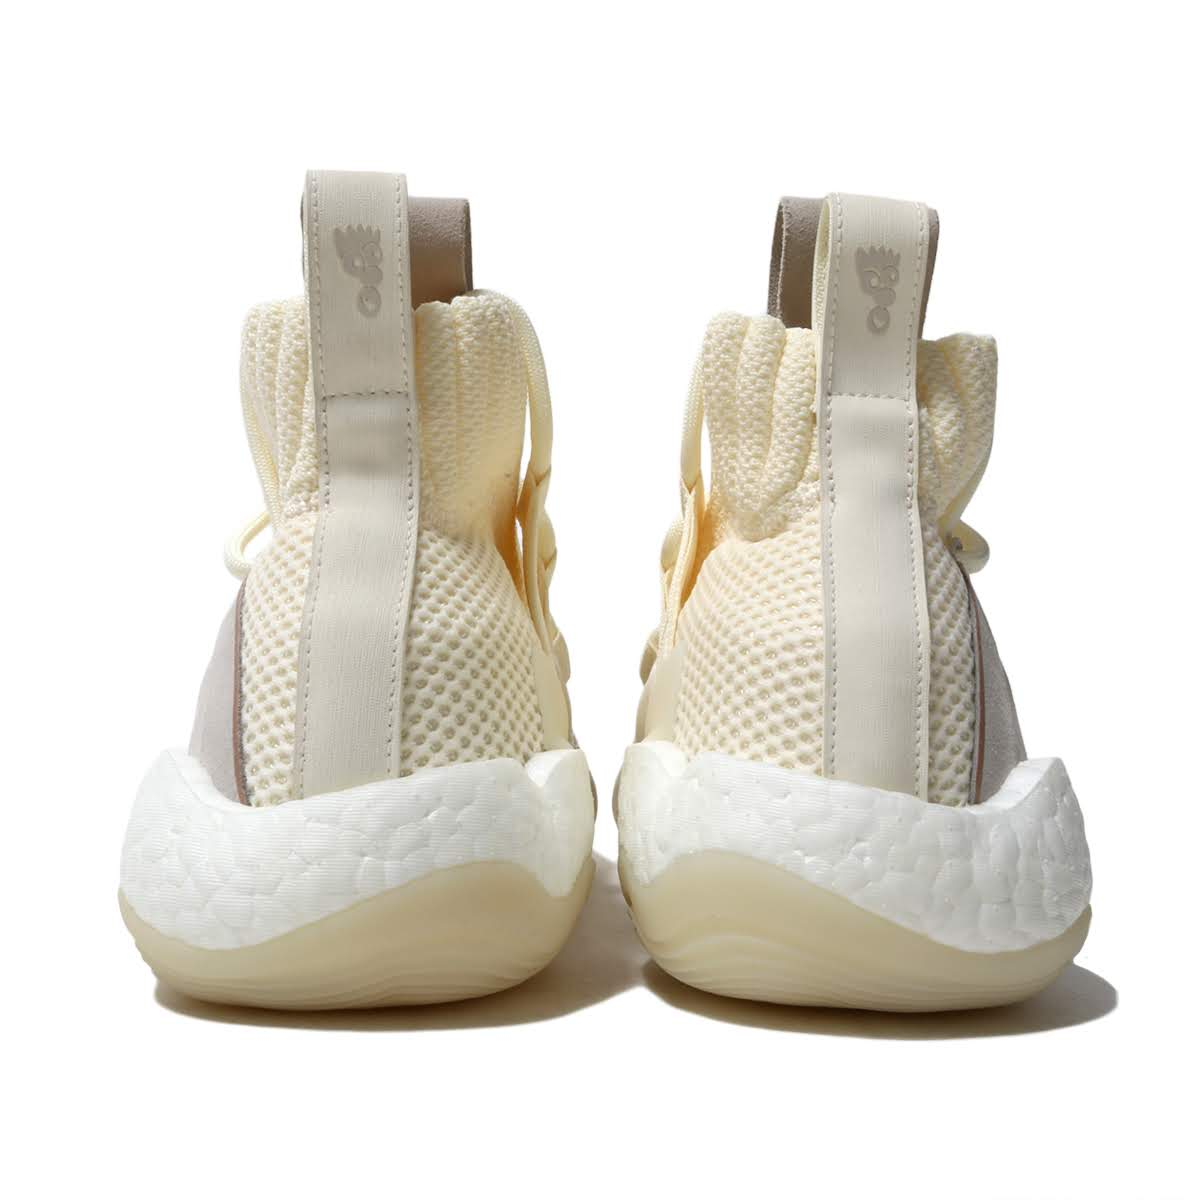 93457b3ba adidas Originals CRAZY BYW LVL X (CREAM WHITE RAW WHITE RAW AMBER) (Adidas  originals crazy BYW LVL X)